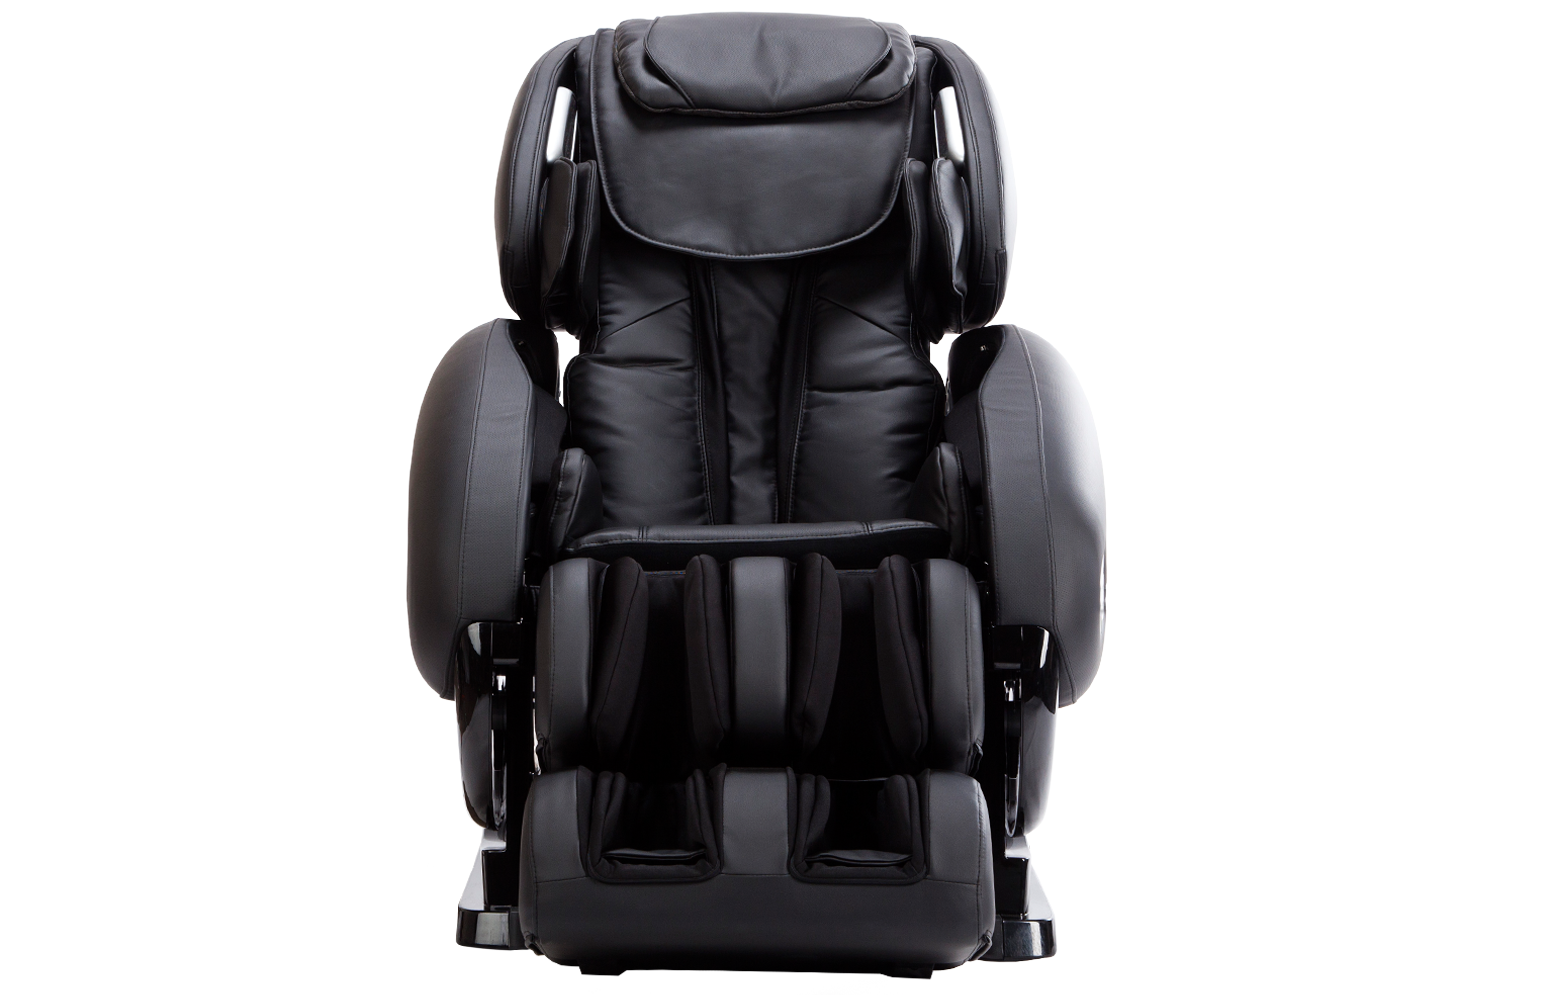 Relax 2 zero 3D massage chair black